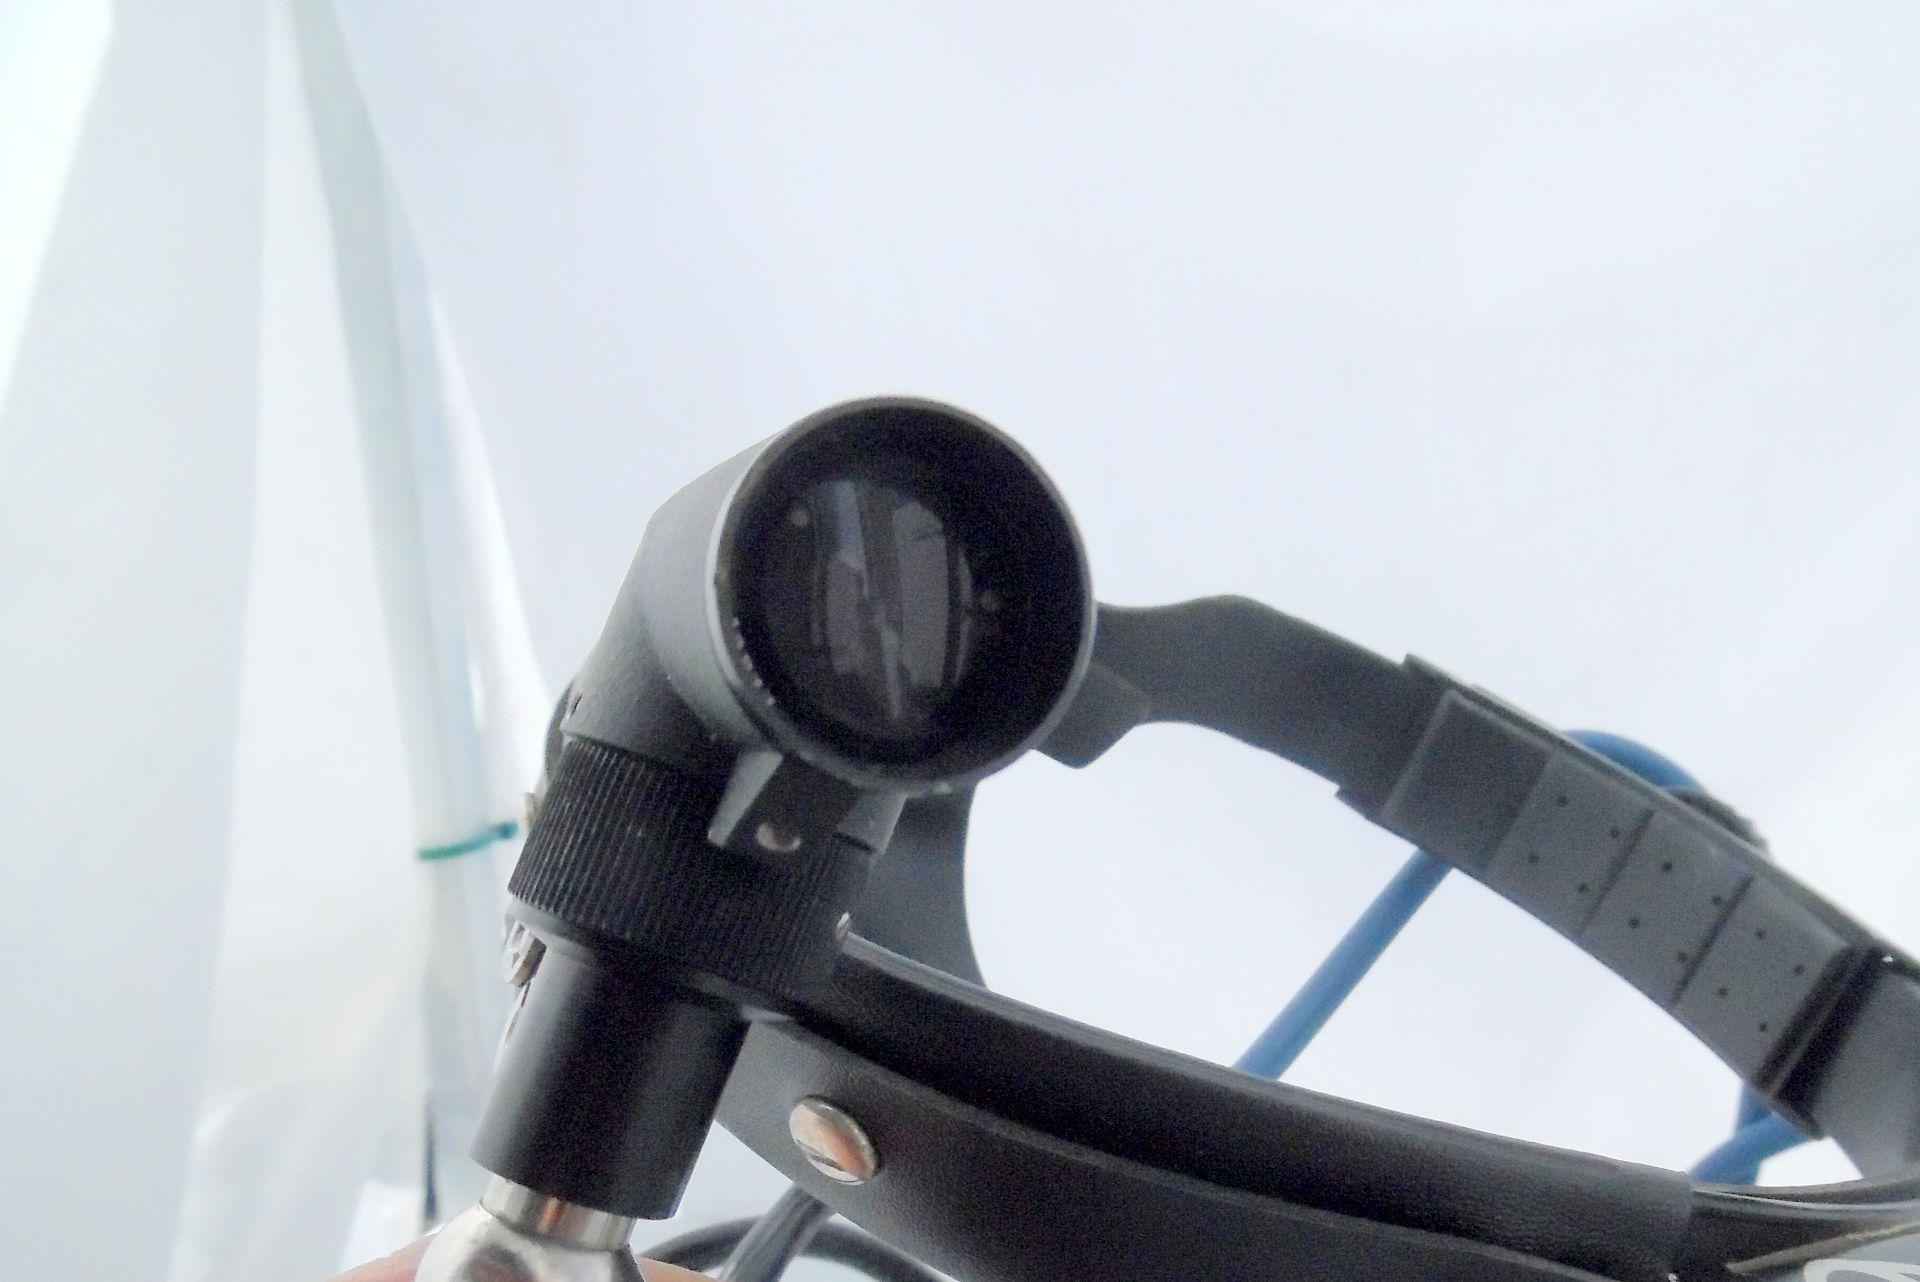 Cuda Model I-150 Light Source 120V 200 Watts - Image 3 of 5